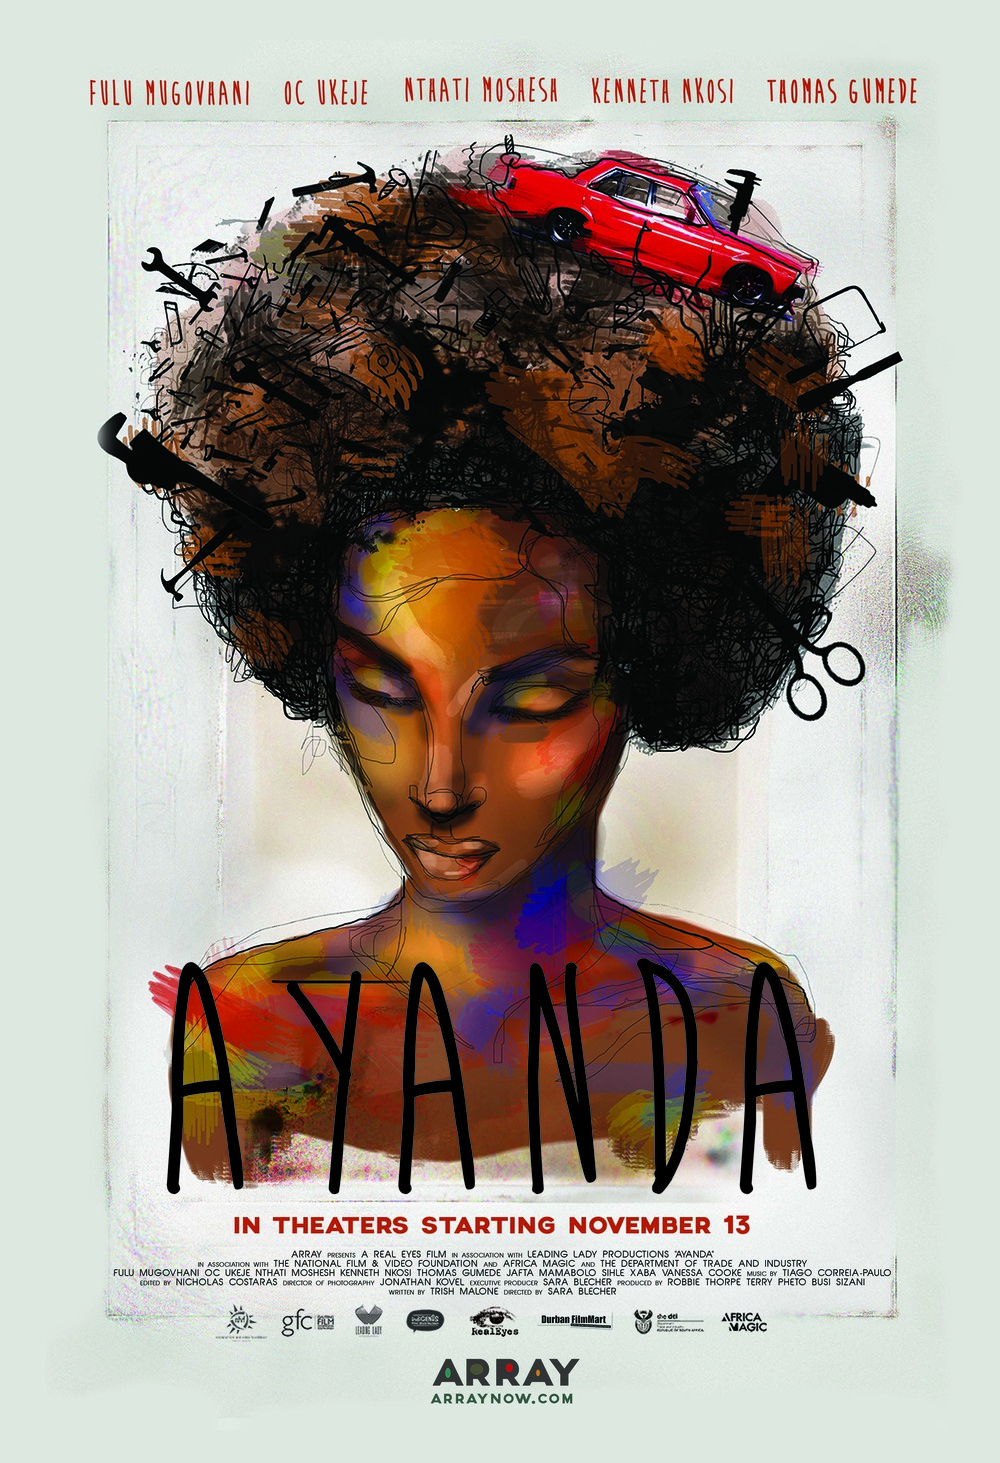 AYANDA [ARRAY Release!]